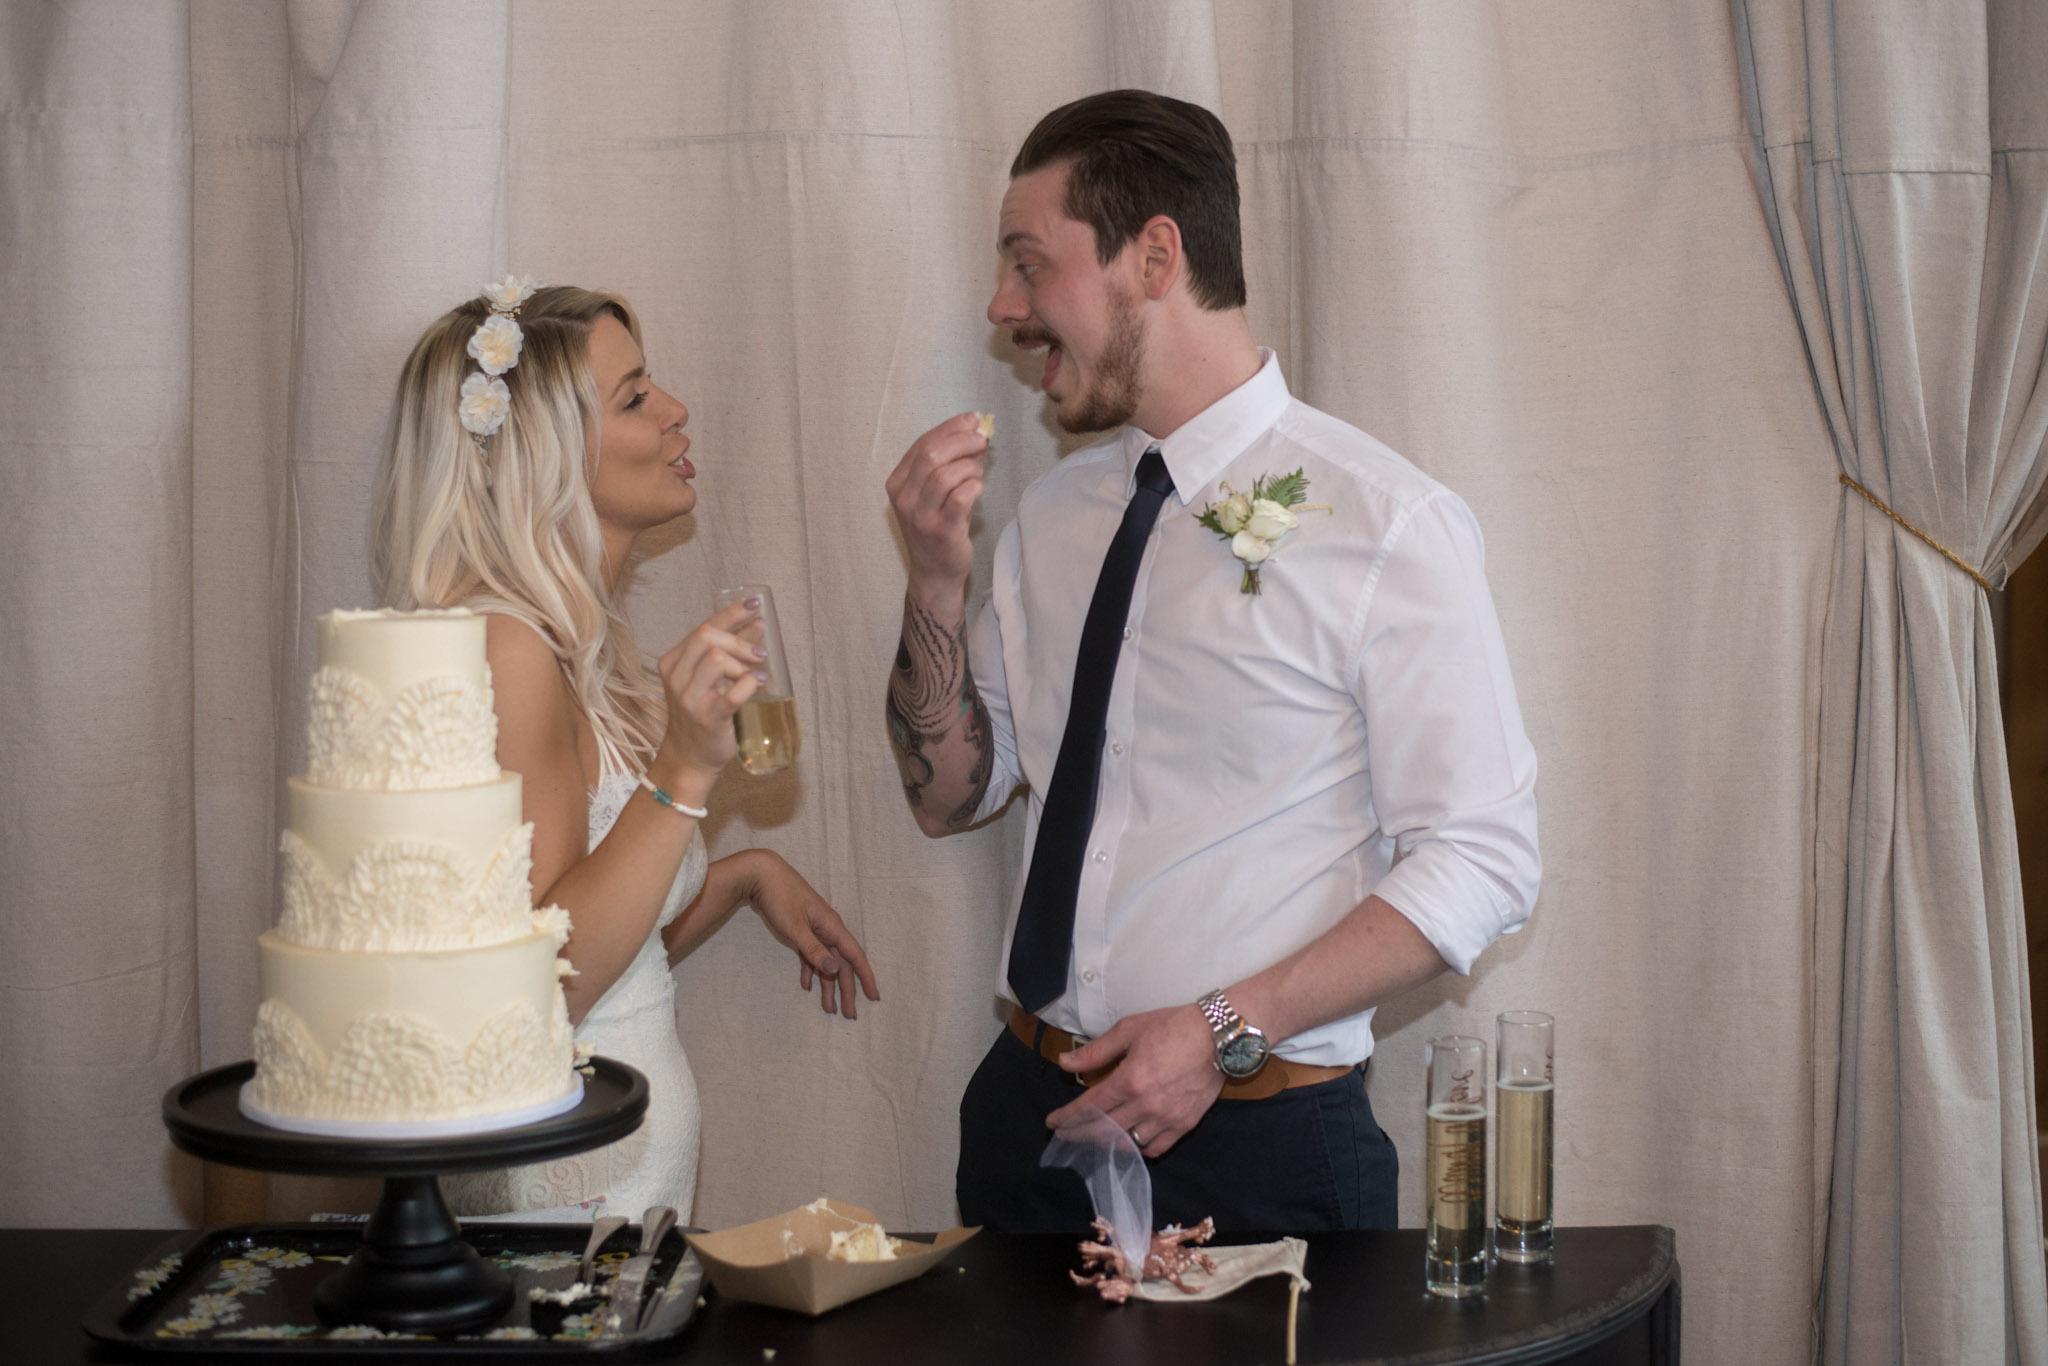 Kansas_City_Intimate_Small_Budget_Wedding_Venue_Dalton&Lauren_253.jpg